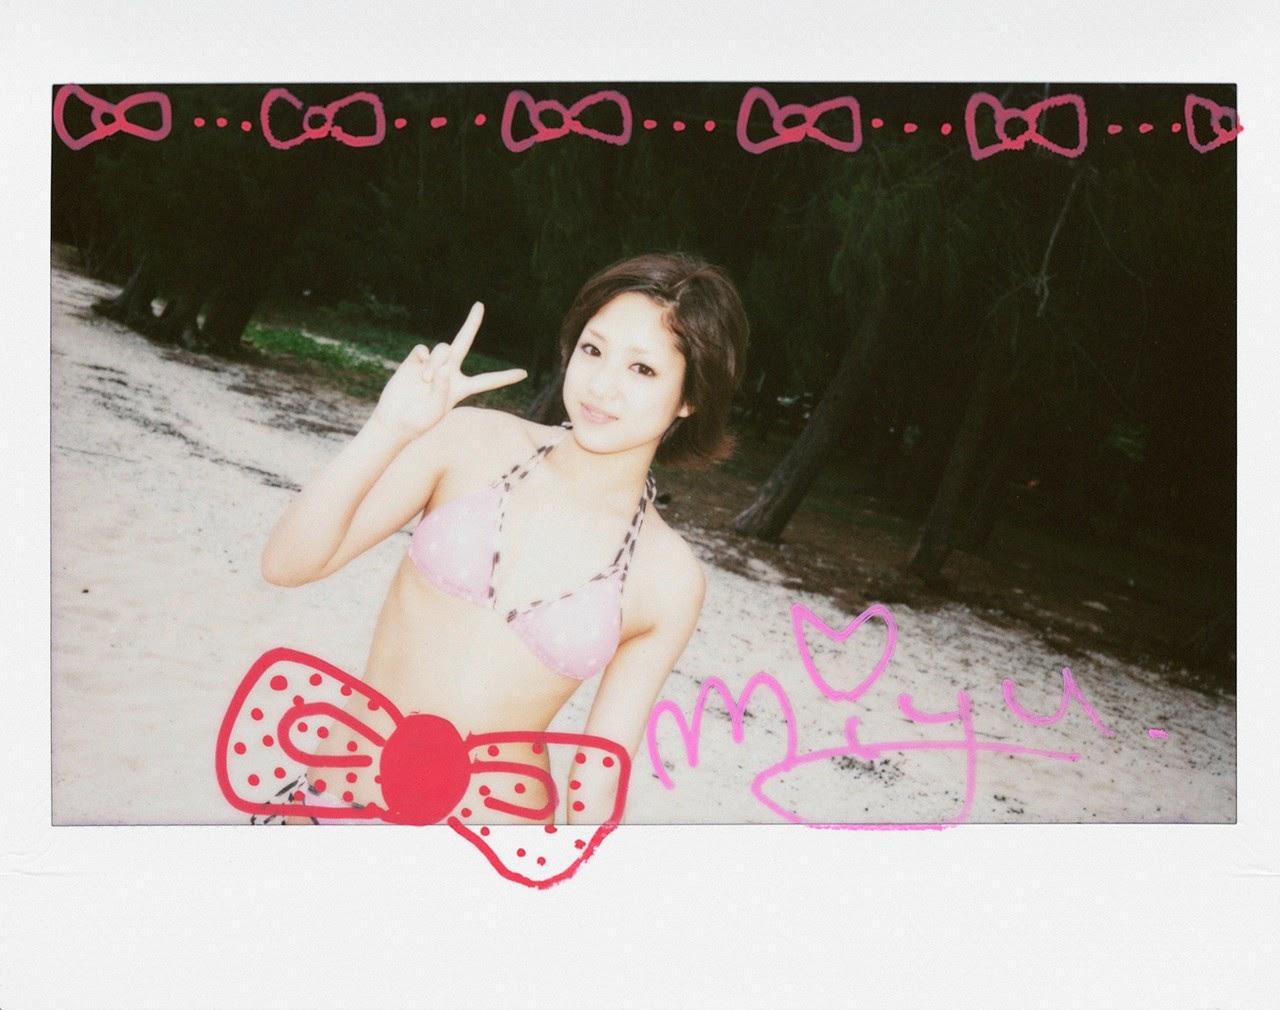 Miracle beautiful high school girl worthy of the name fairy ultimate beautiful girl010